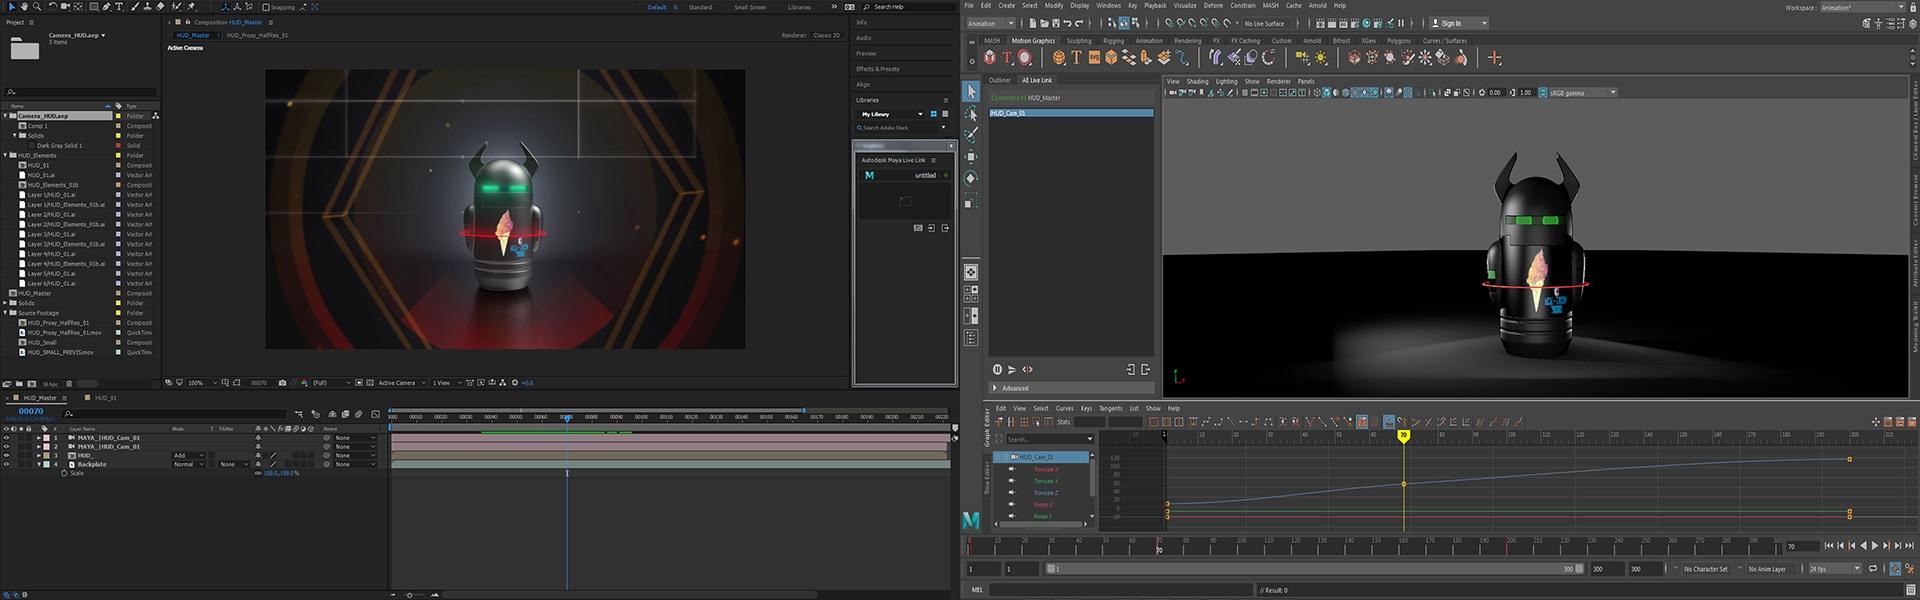 《Mac软件:Autodesk Maya 2018.5_中/英/日/多语言版_三维建模动画渲染软件》